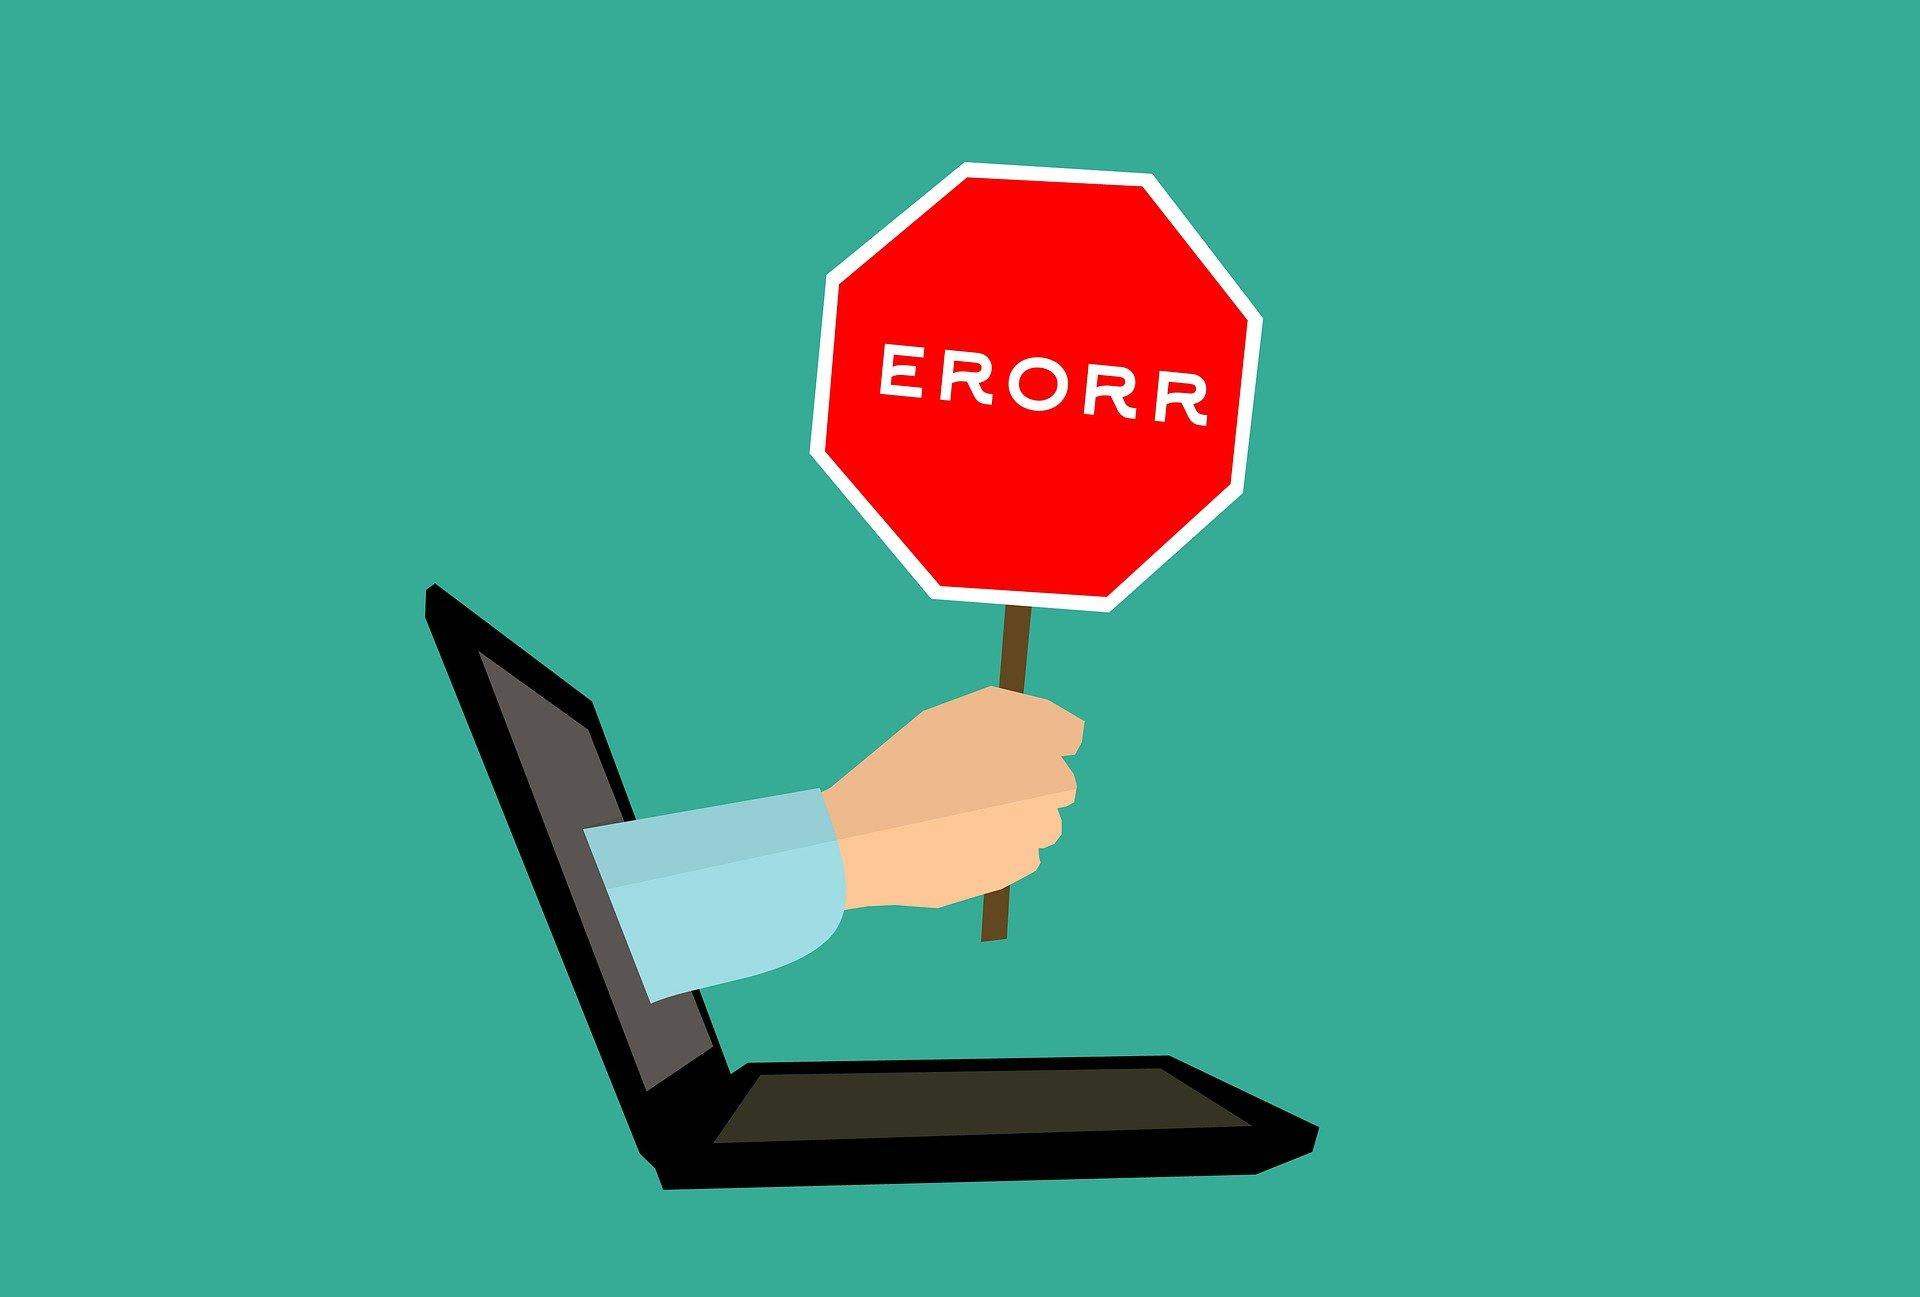 Die 10 größten Irrtümer zum Thema e-Learning